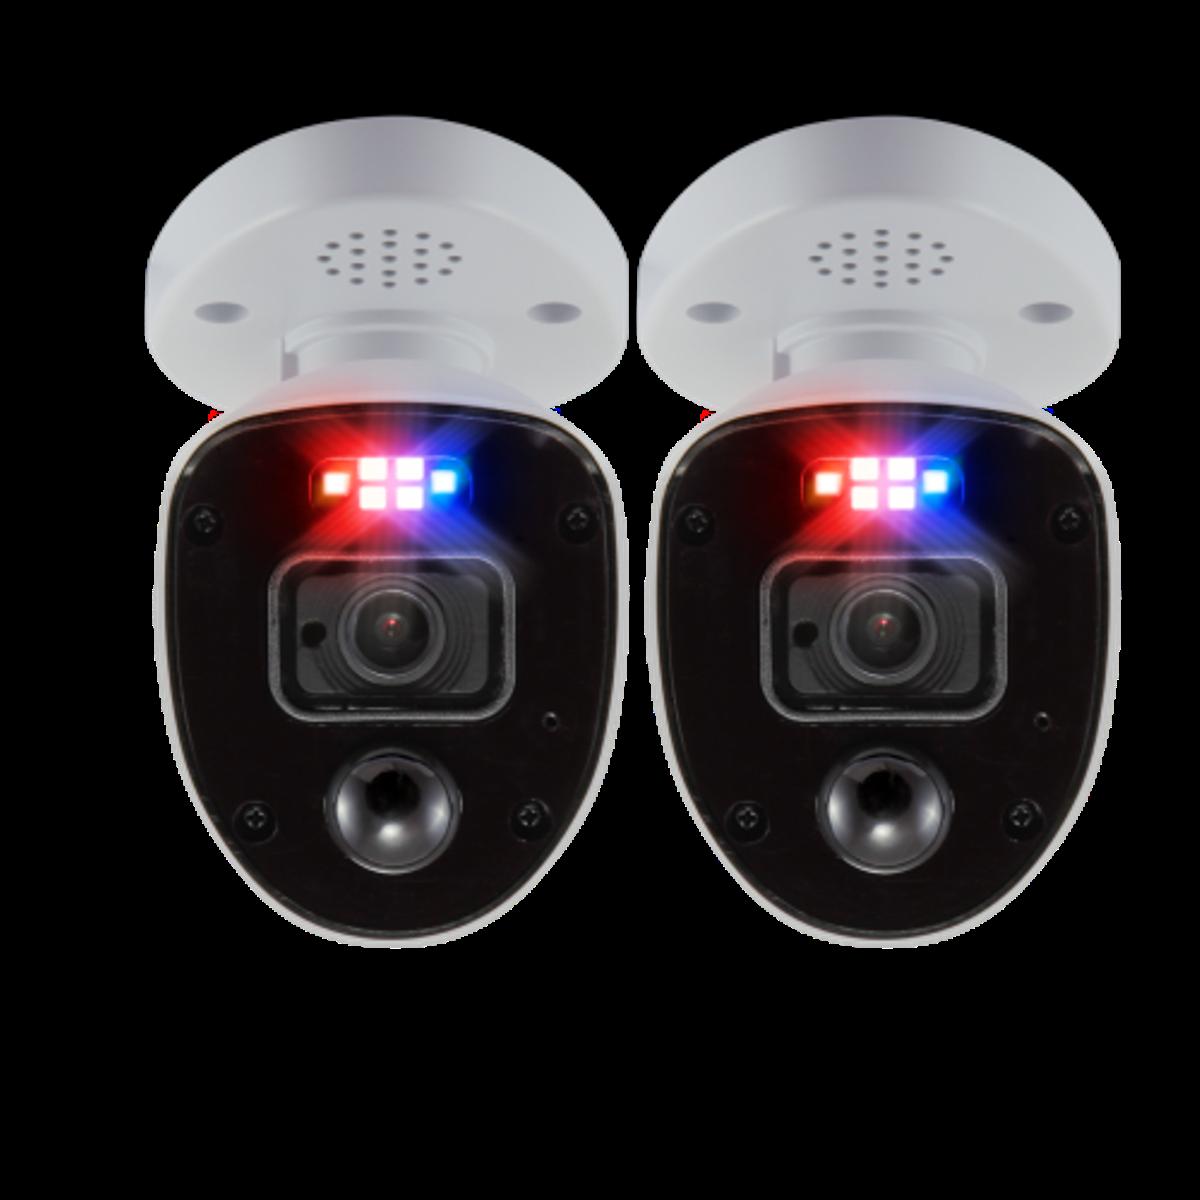 Caméra x2 add. DVR Police